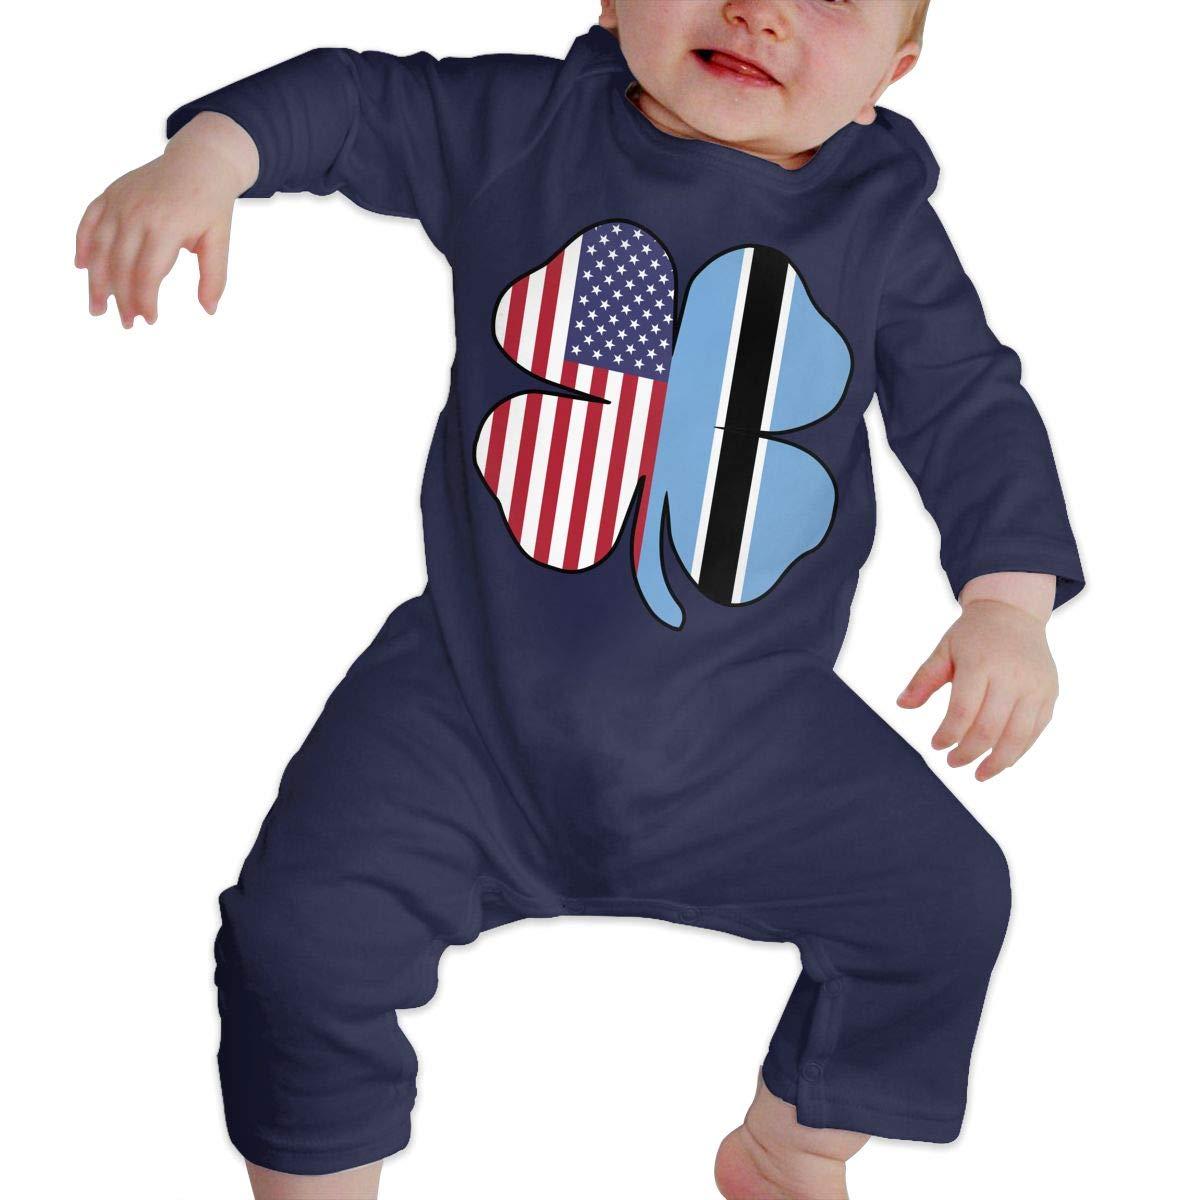 Mri-le1 Baby Girls Coverall American Botswana Flag Shamrock Infant Long Sleeve Romper Jumpsuit